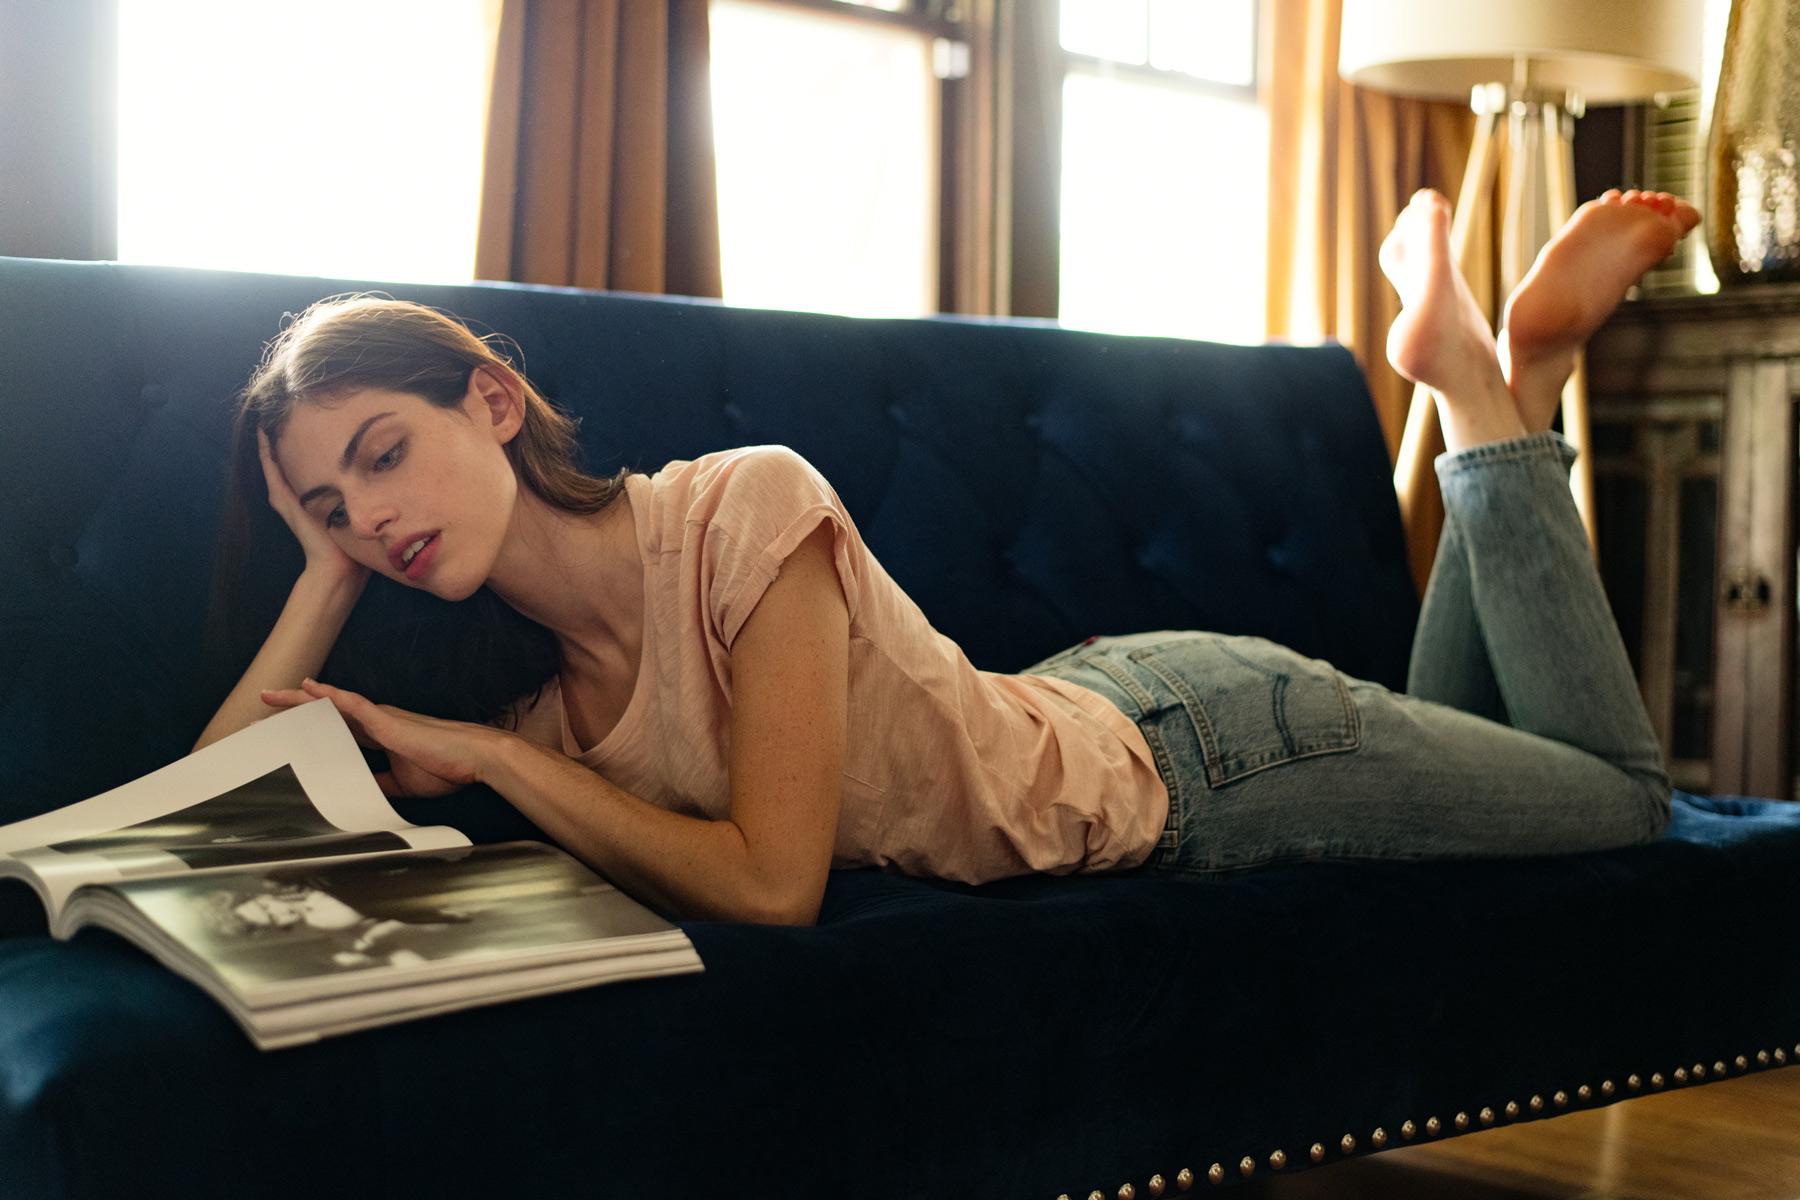 woman-reads-magazine-on-sofa-backlit.jpg